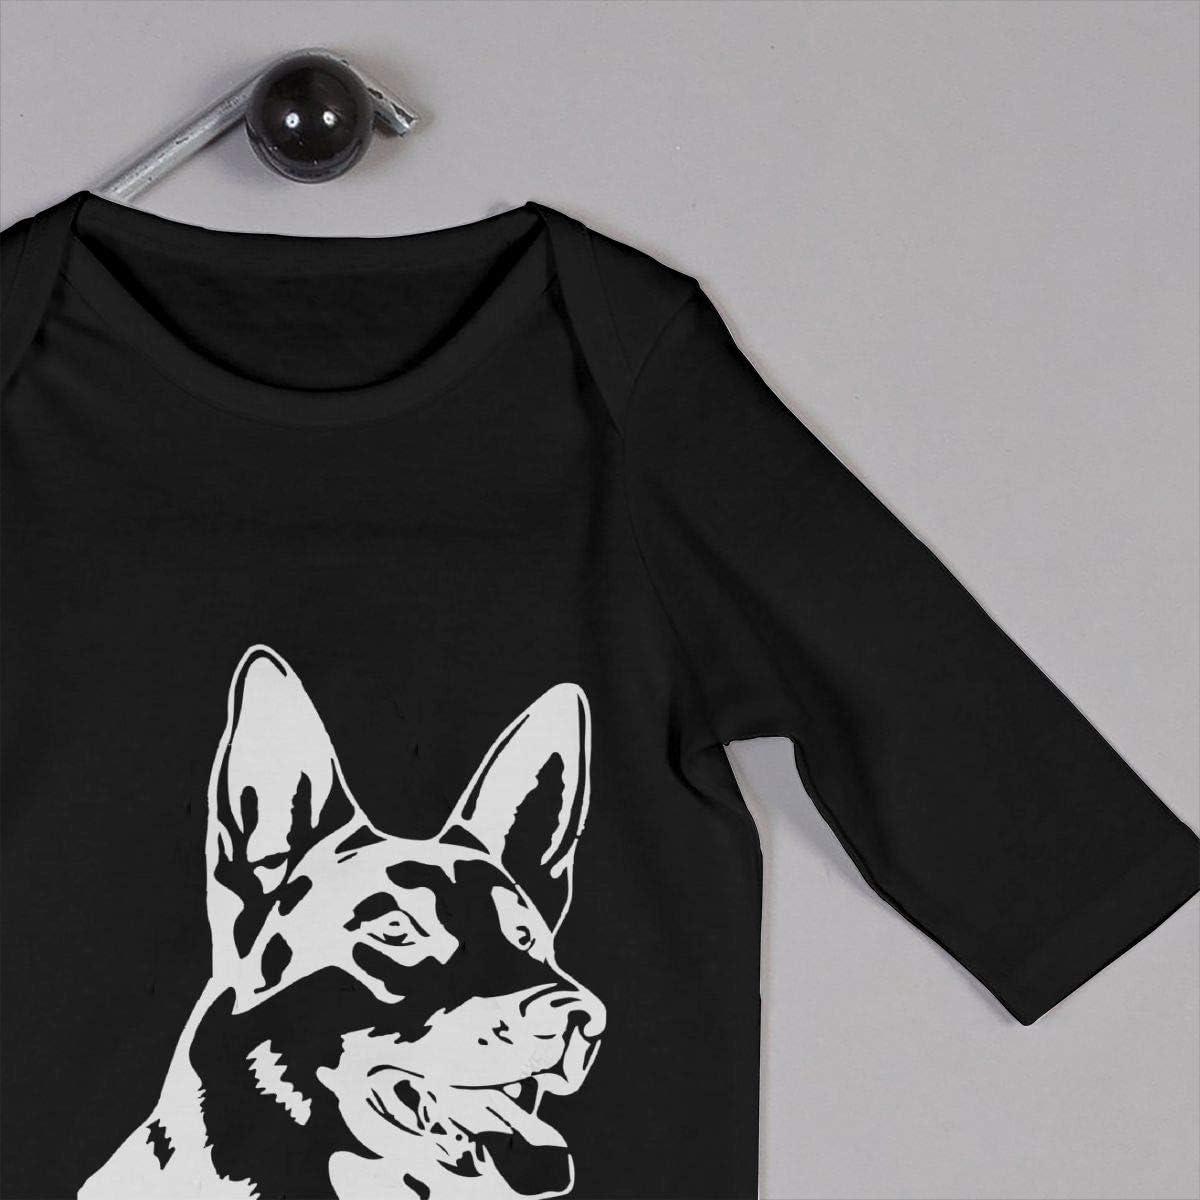 Hot German Shepherd Dog Organic One-Piece Kid Pajamas Clothes Baby Boys Romper Jumpsuit